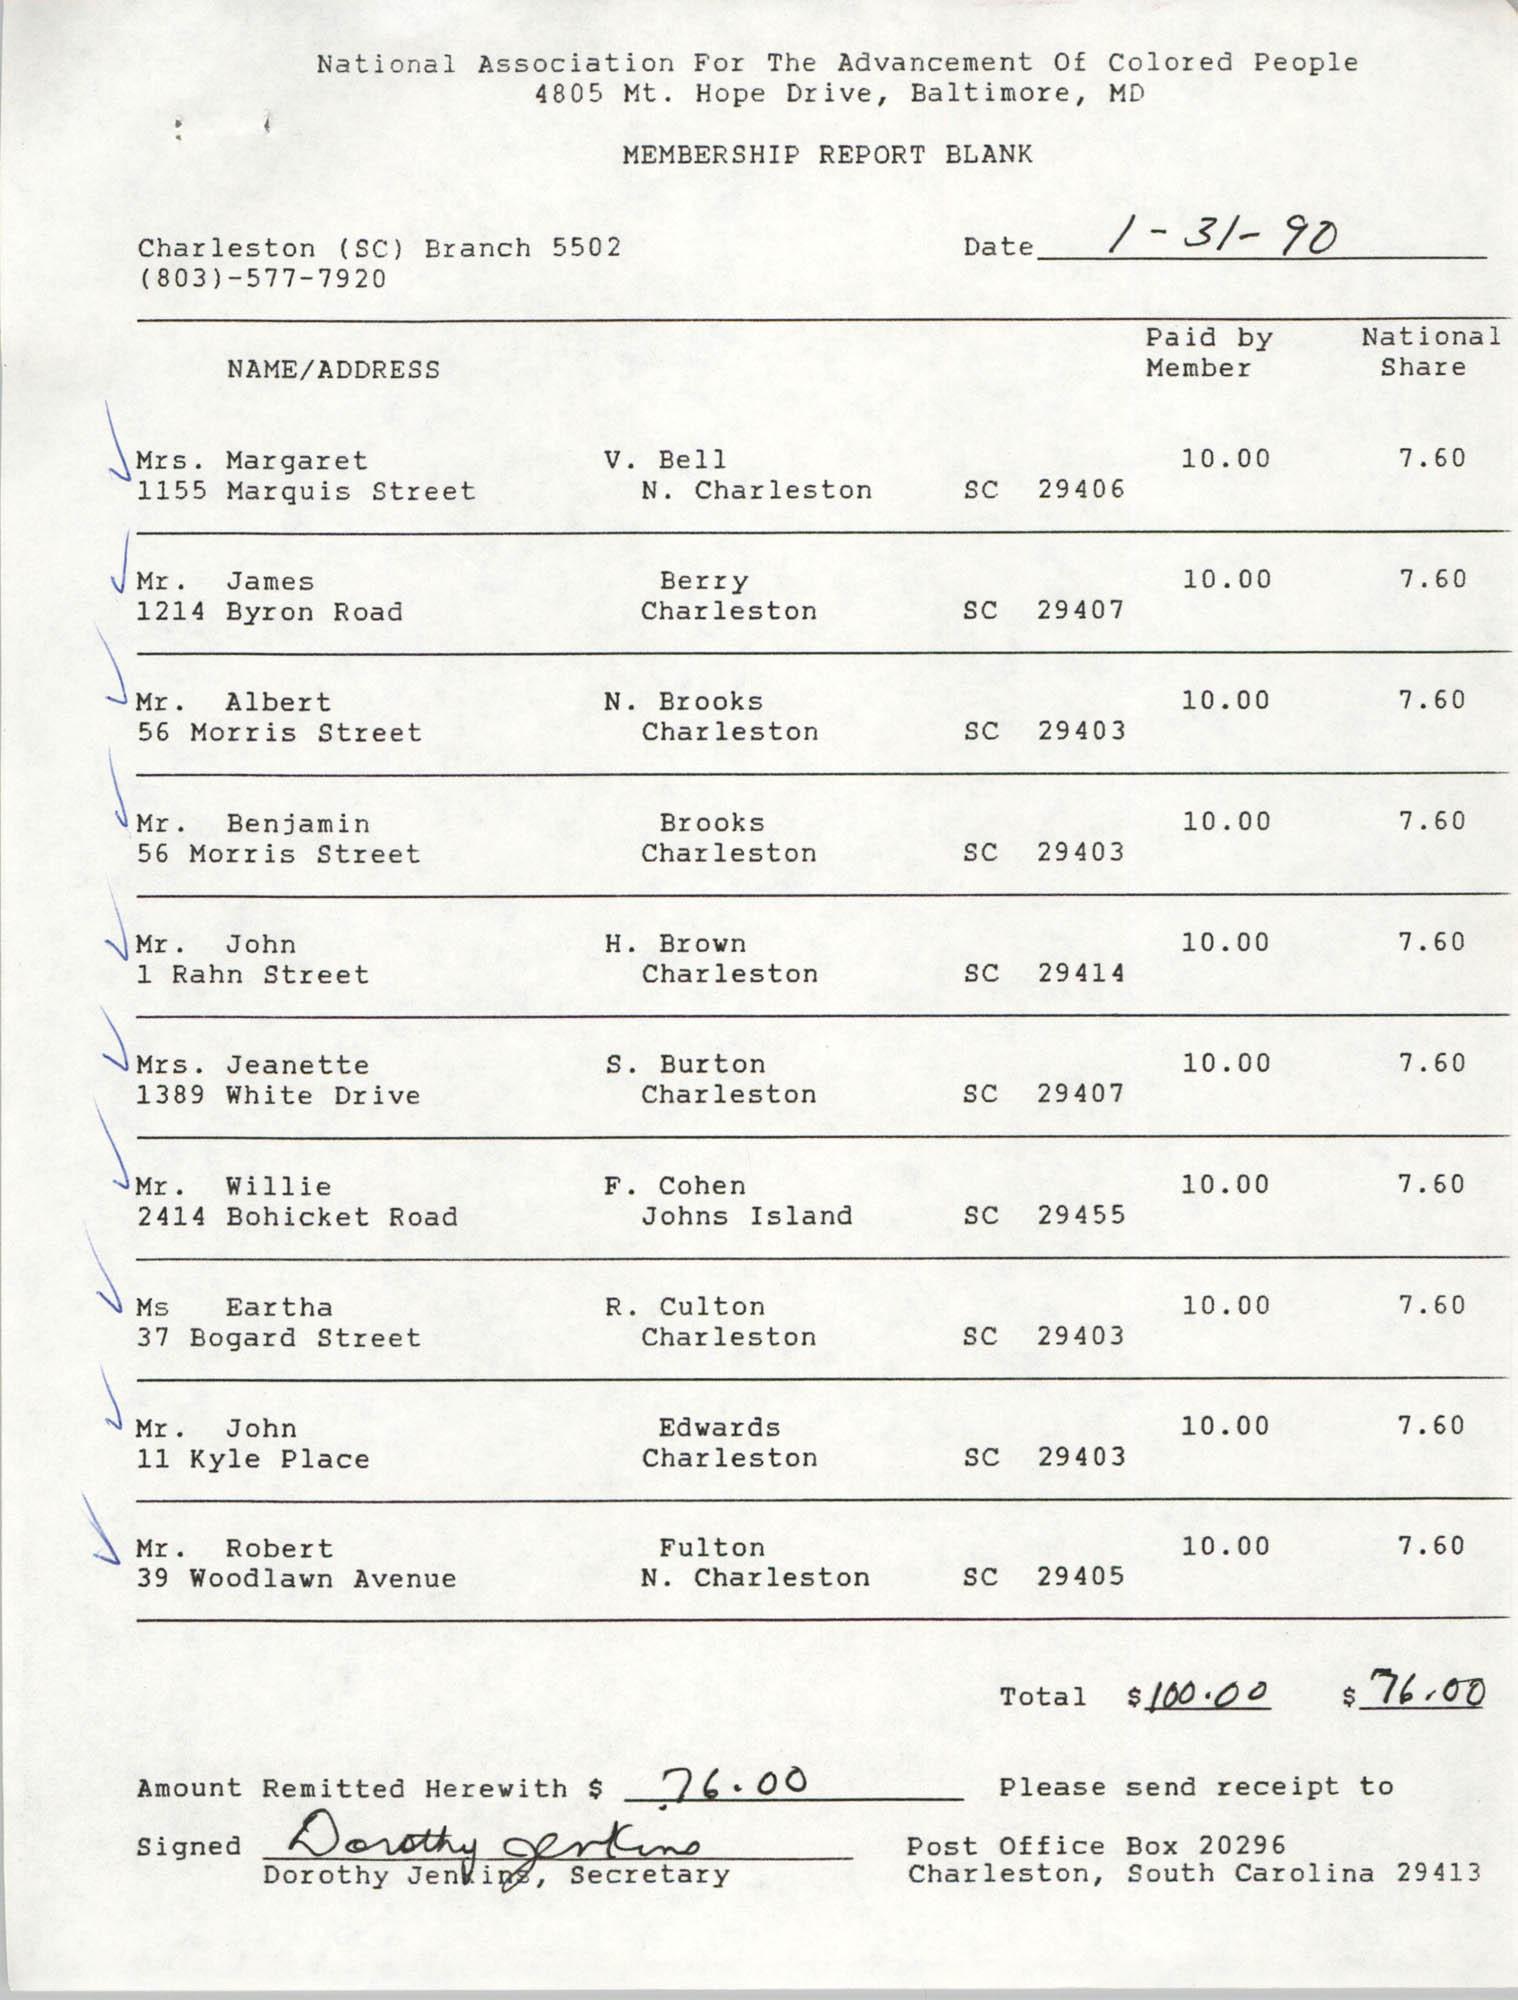 Membership Report Blank, Charleston Branch of the NAACP, Dorothy Jenkins, January 31, 1990